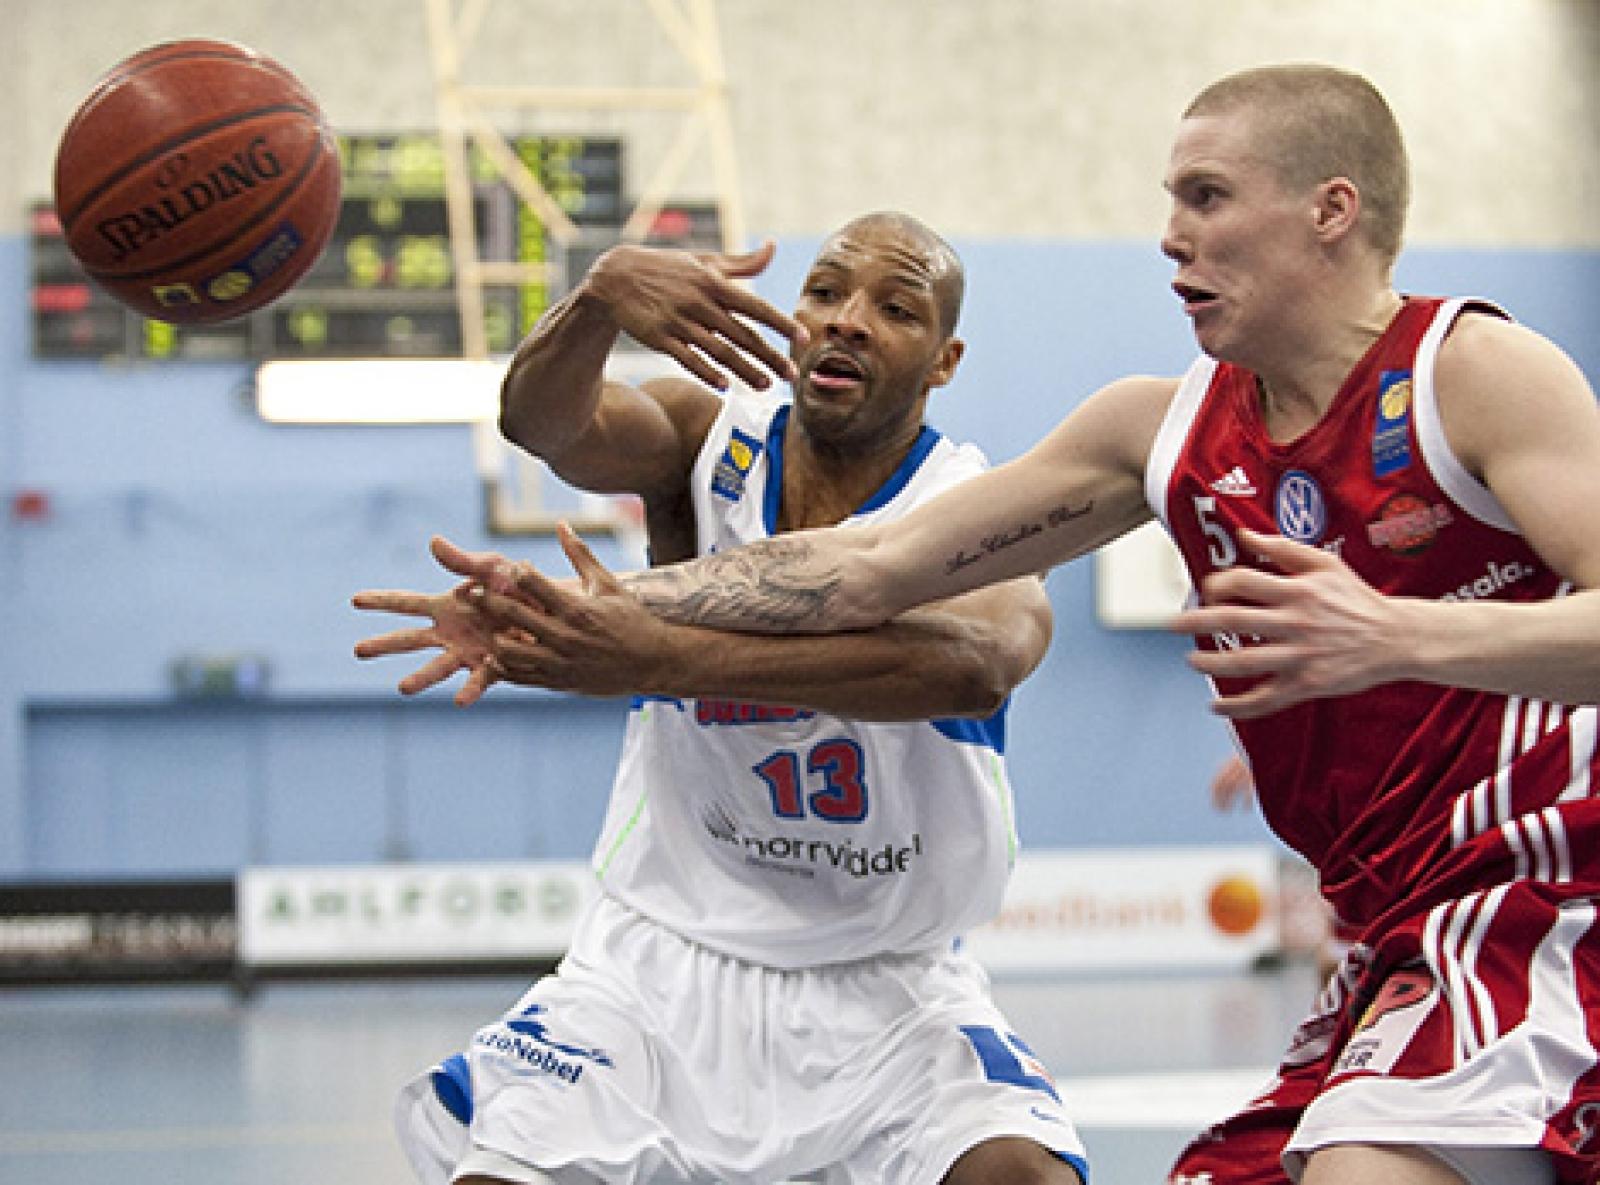 current team uppsala basket - HD1600×1185